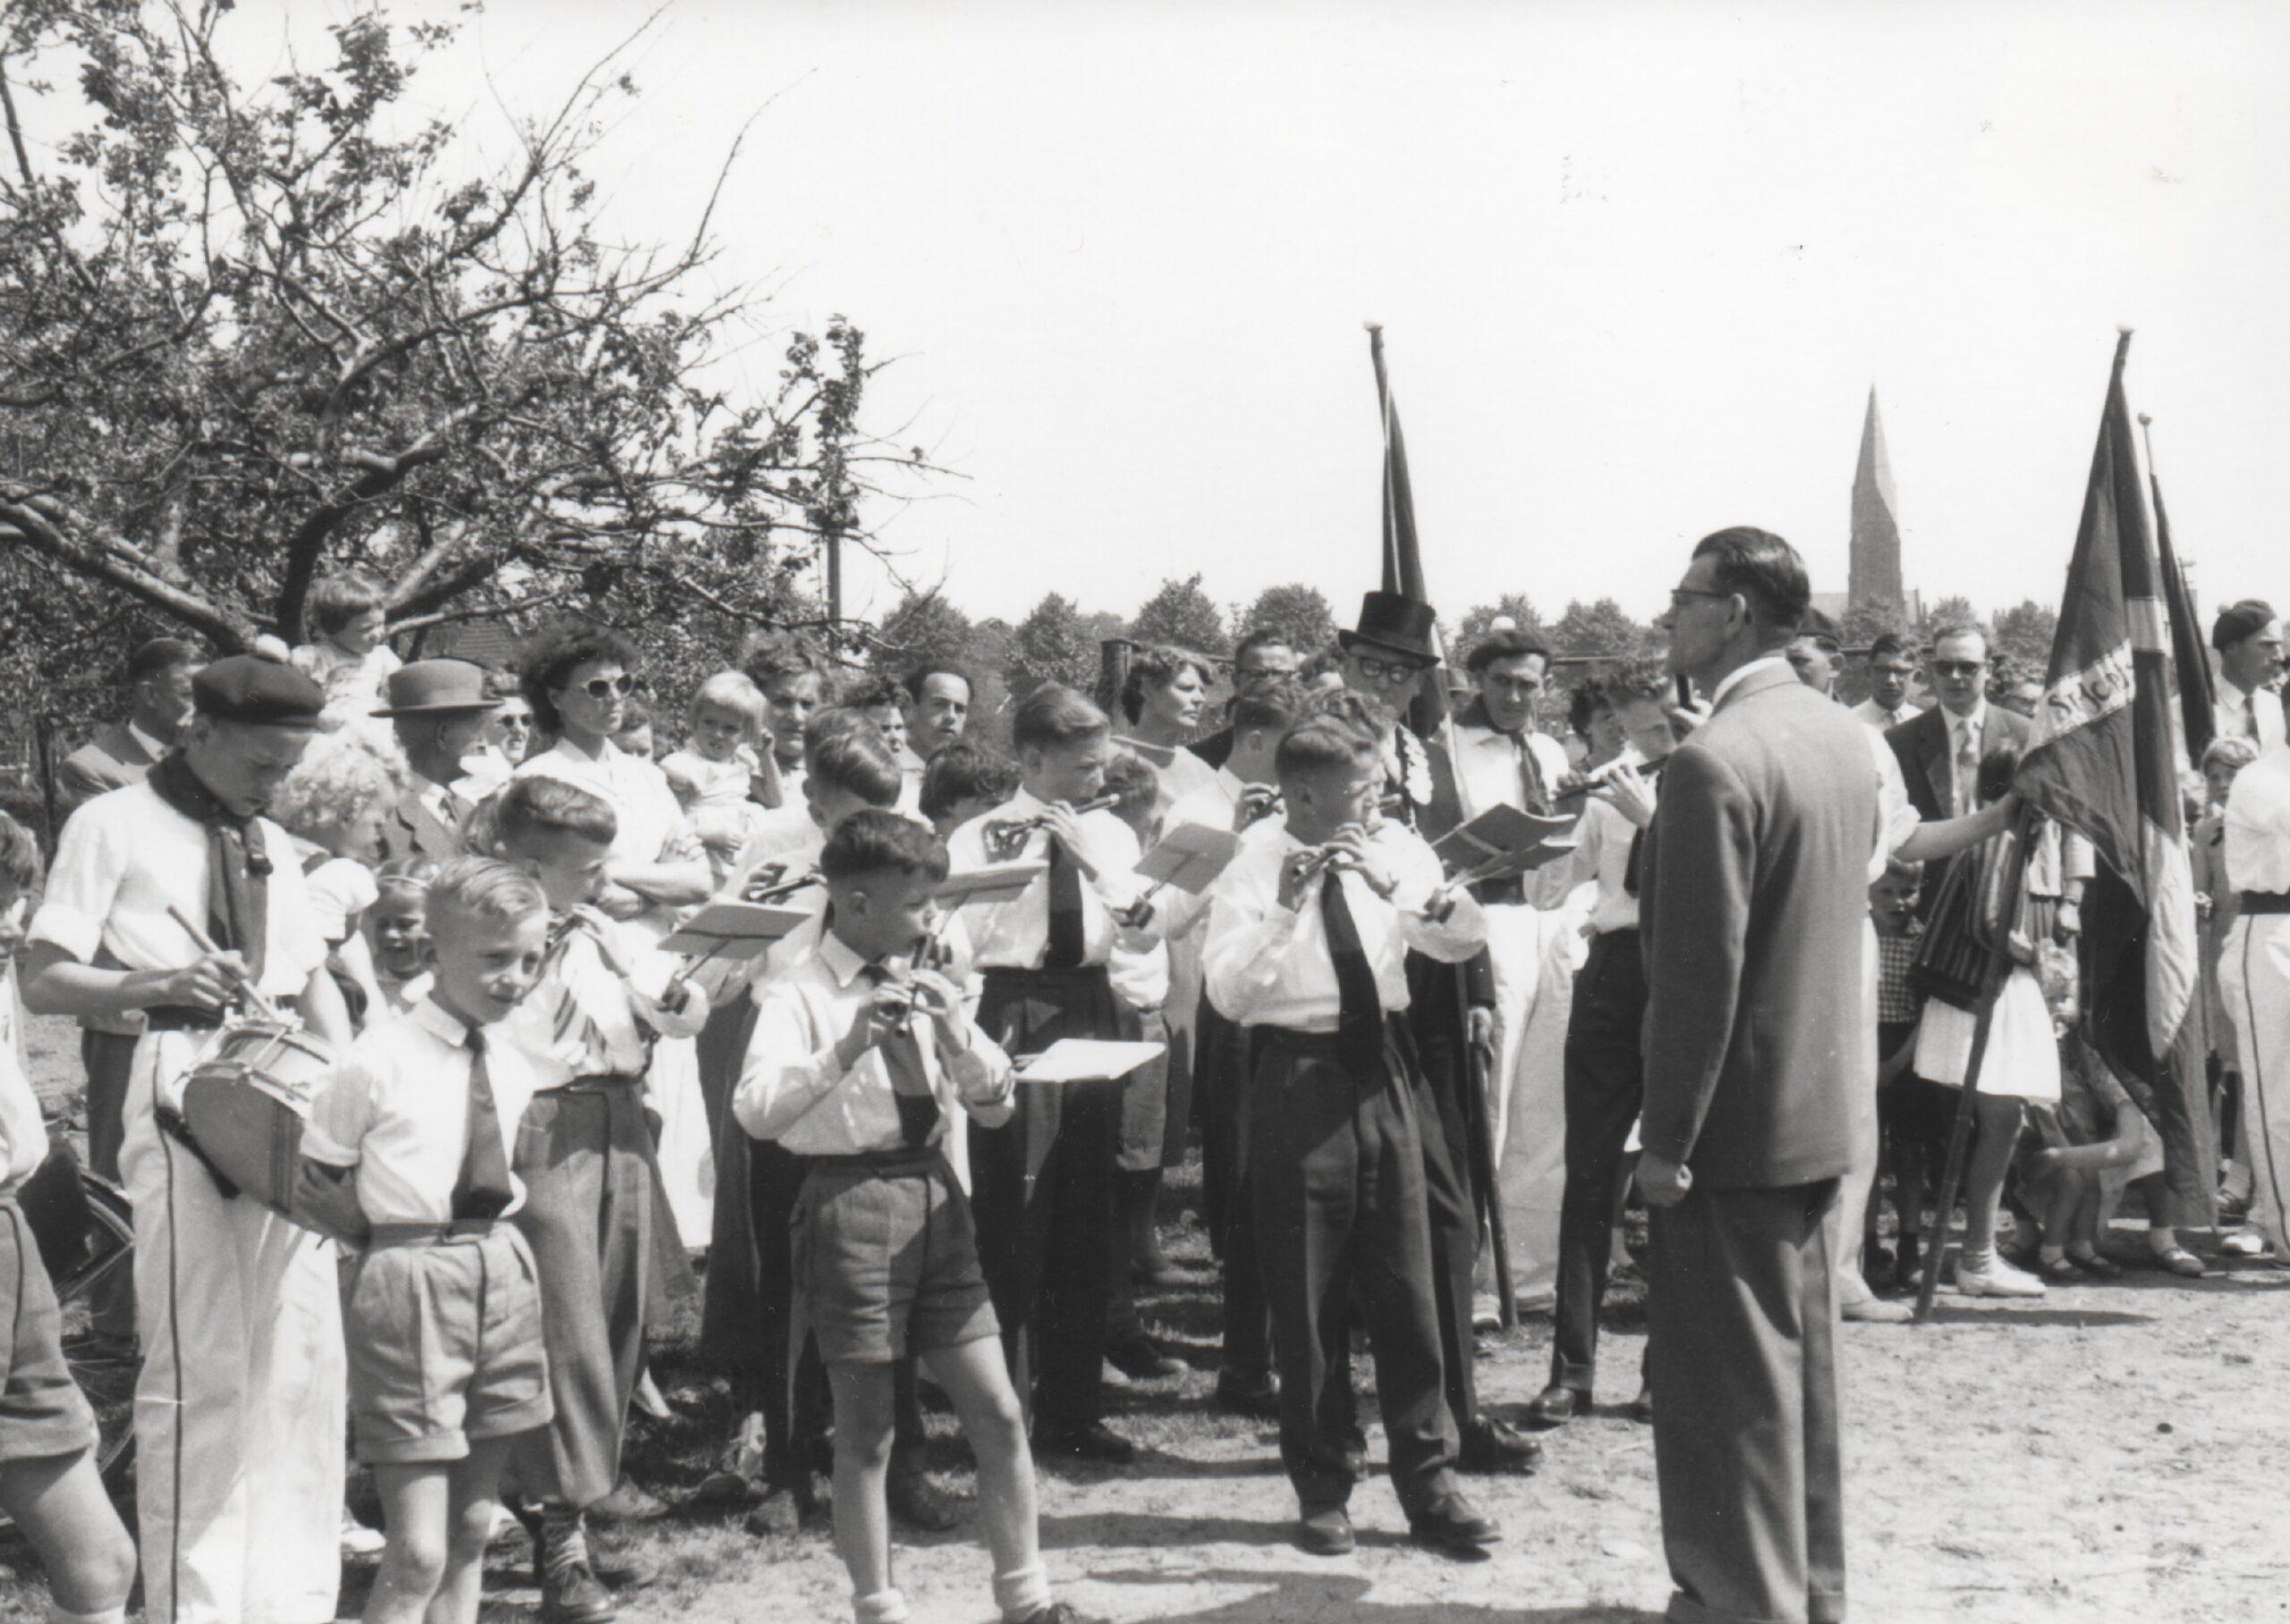 St. Joris 75 jaar! 4 oktober 1945 - 2020